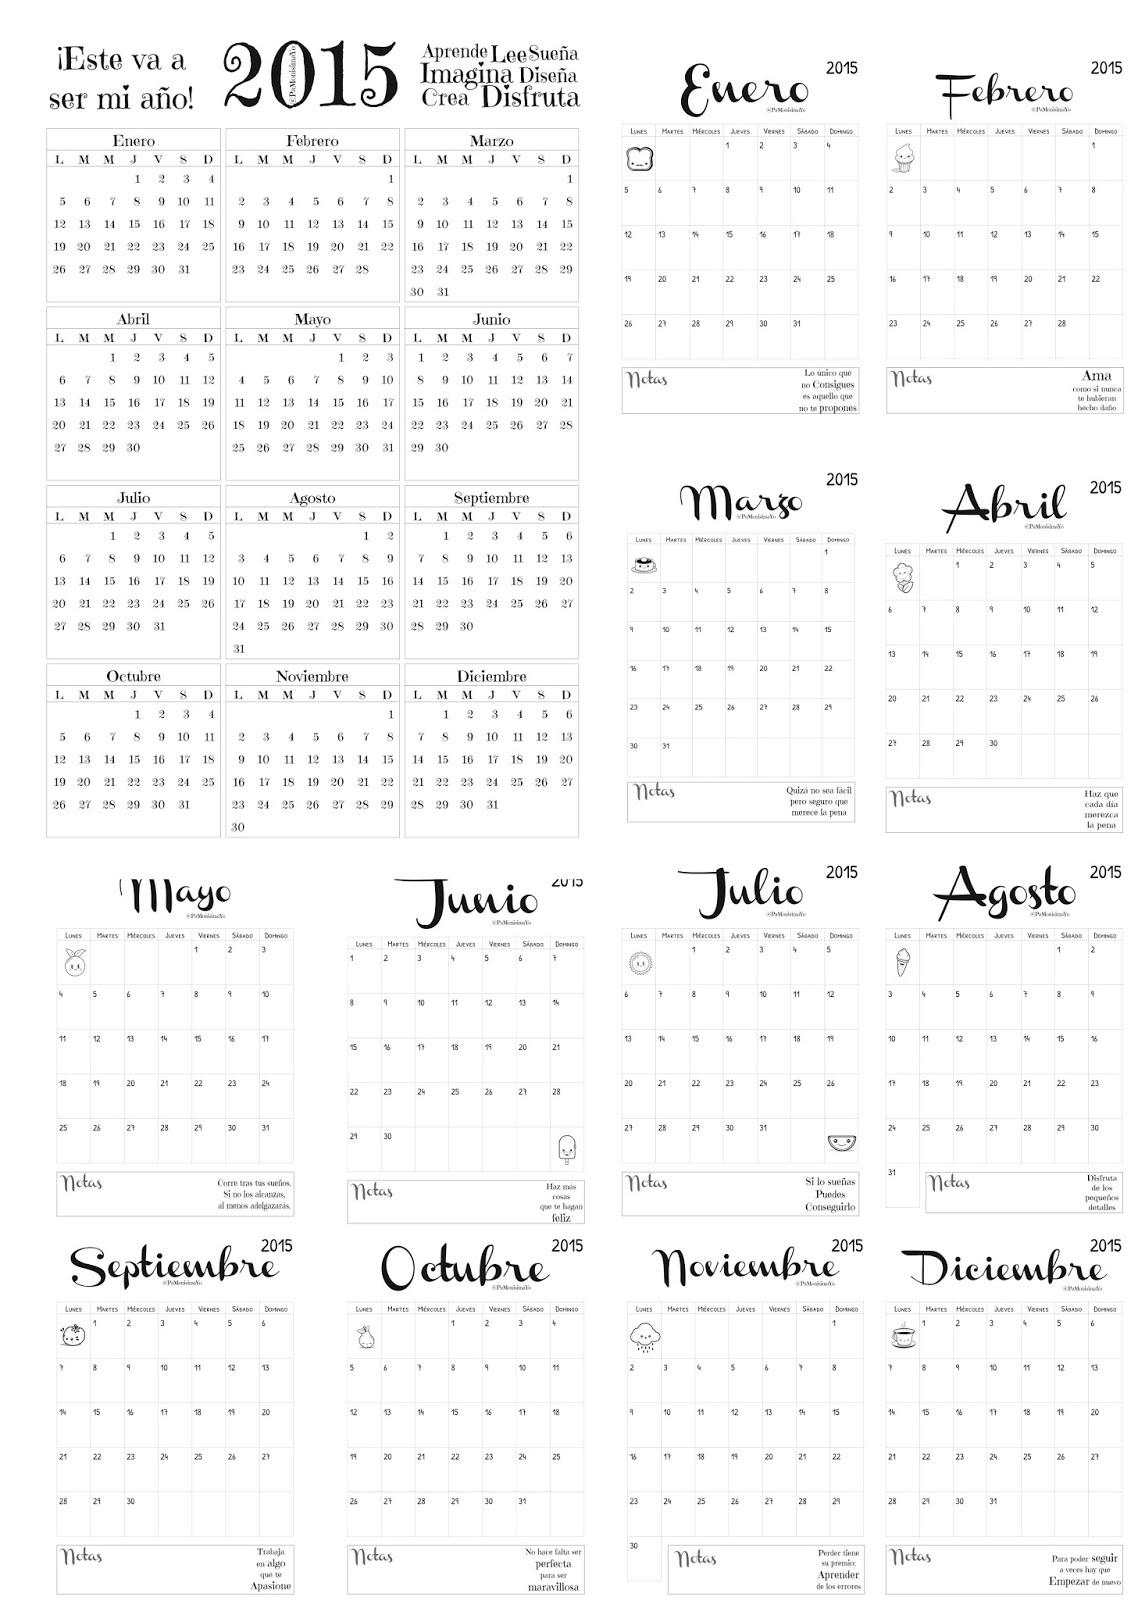 Calendario imprimible 2015 @pamonisimayo